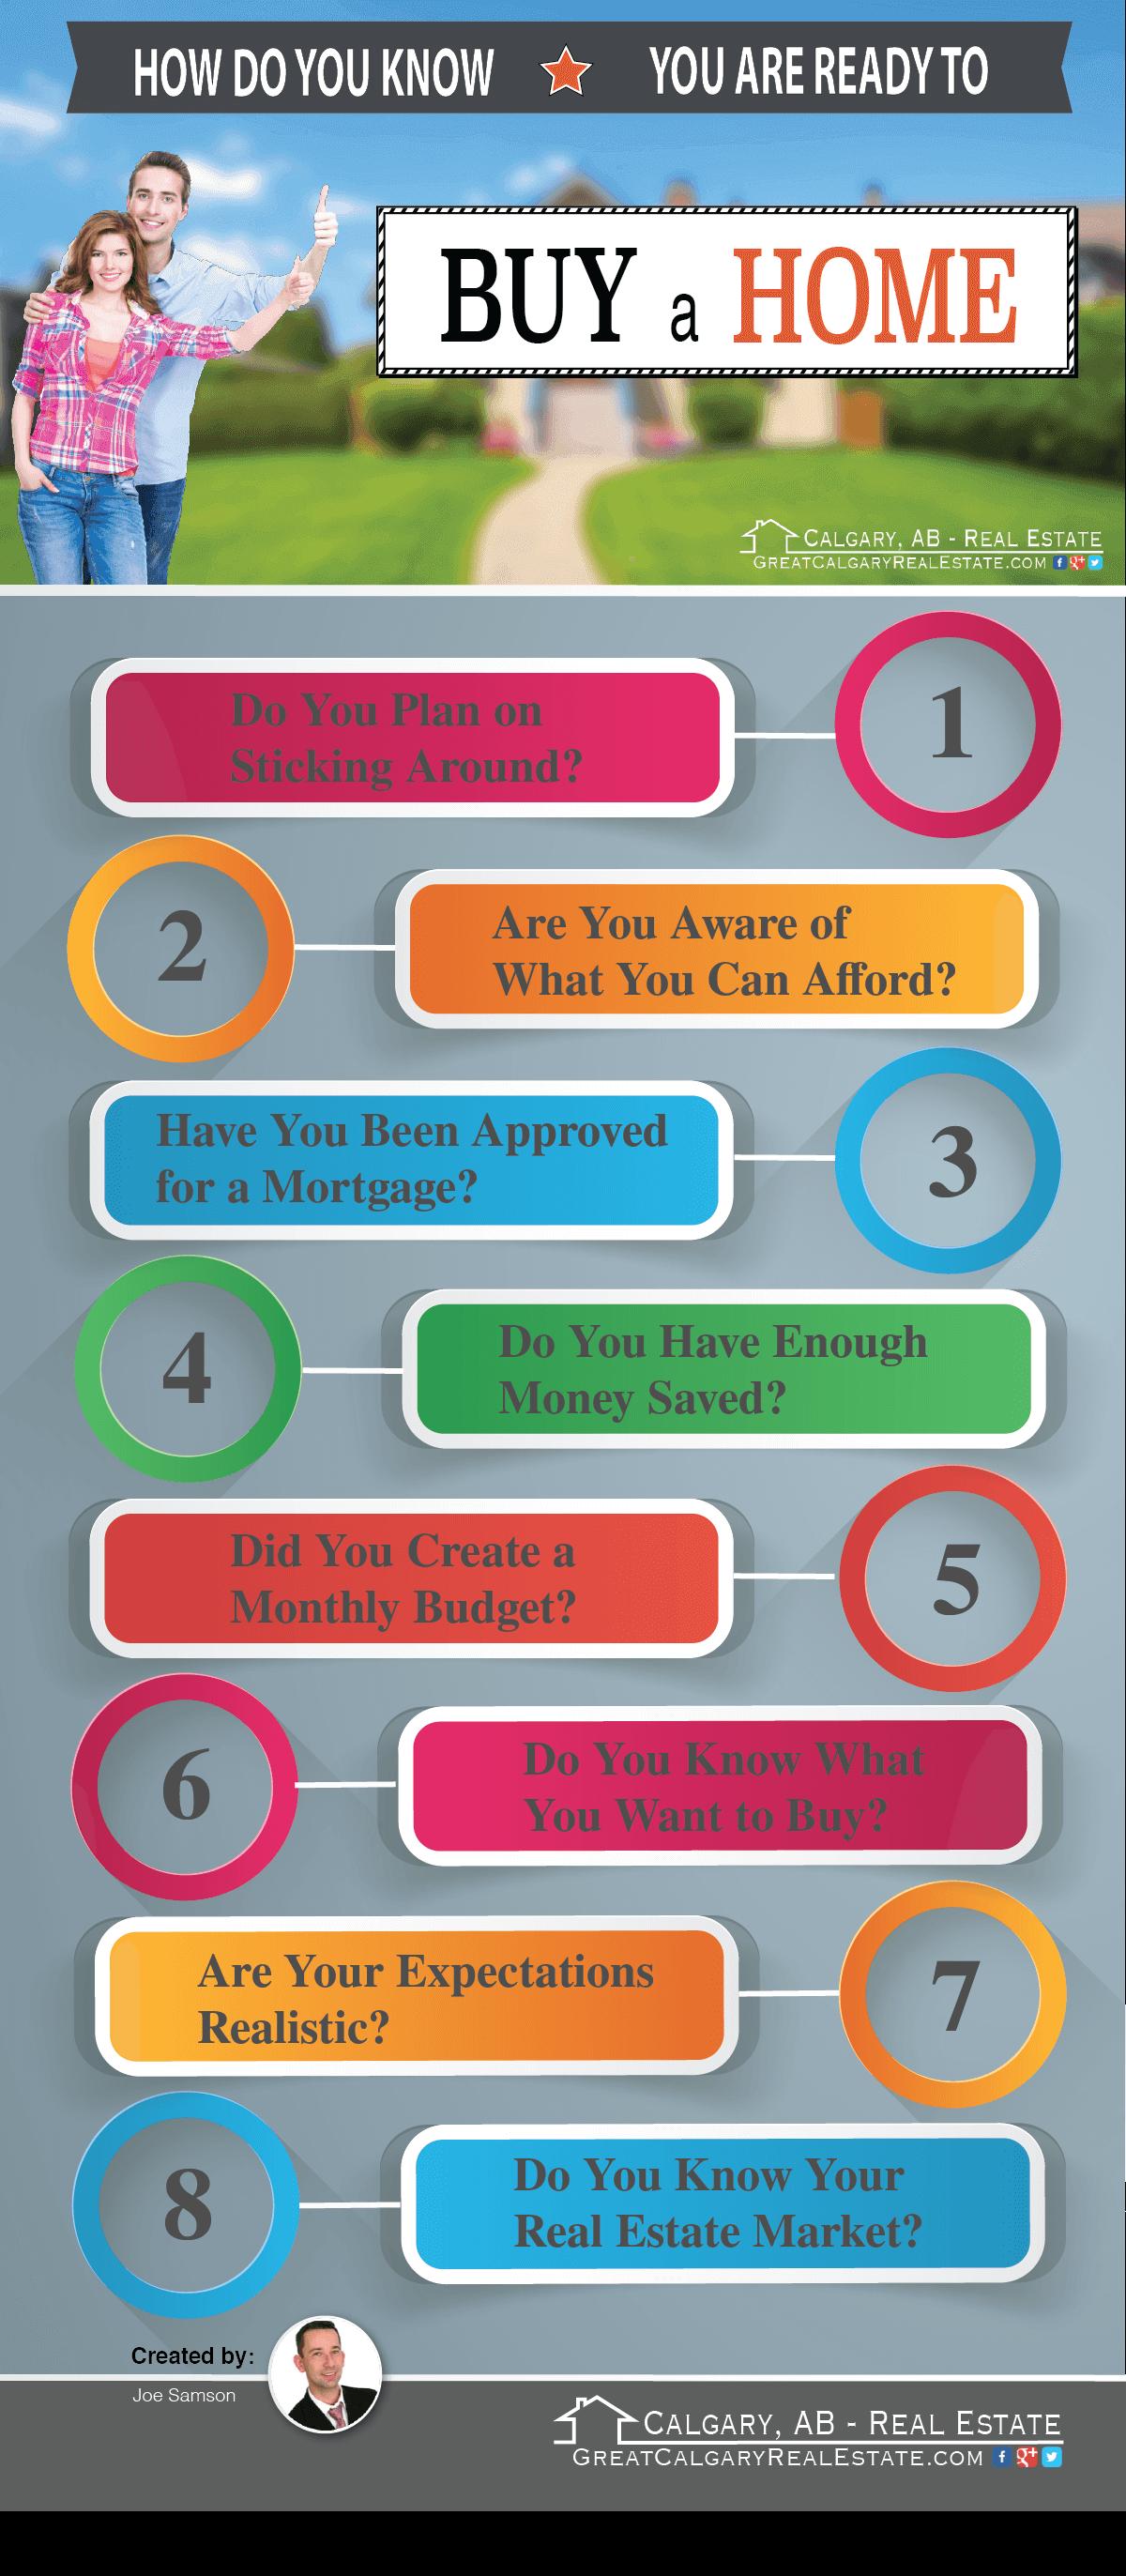 Ready to buy a home checklist